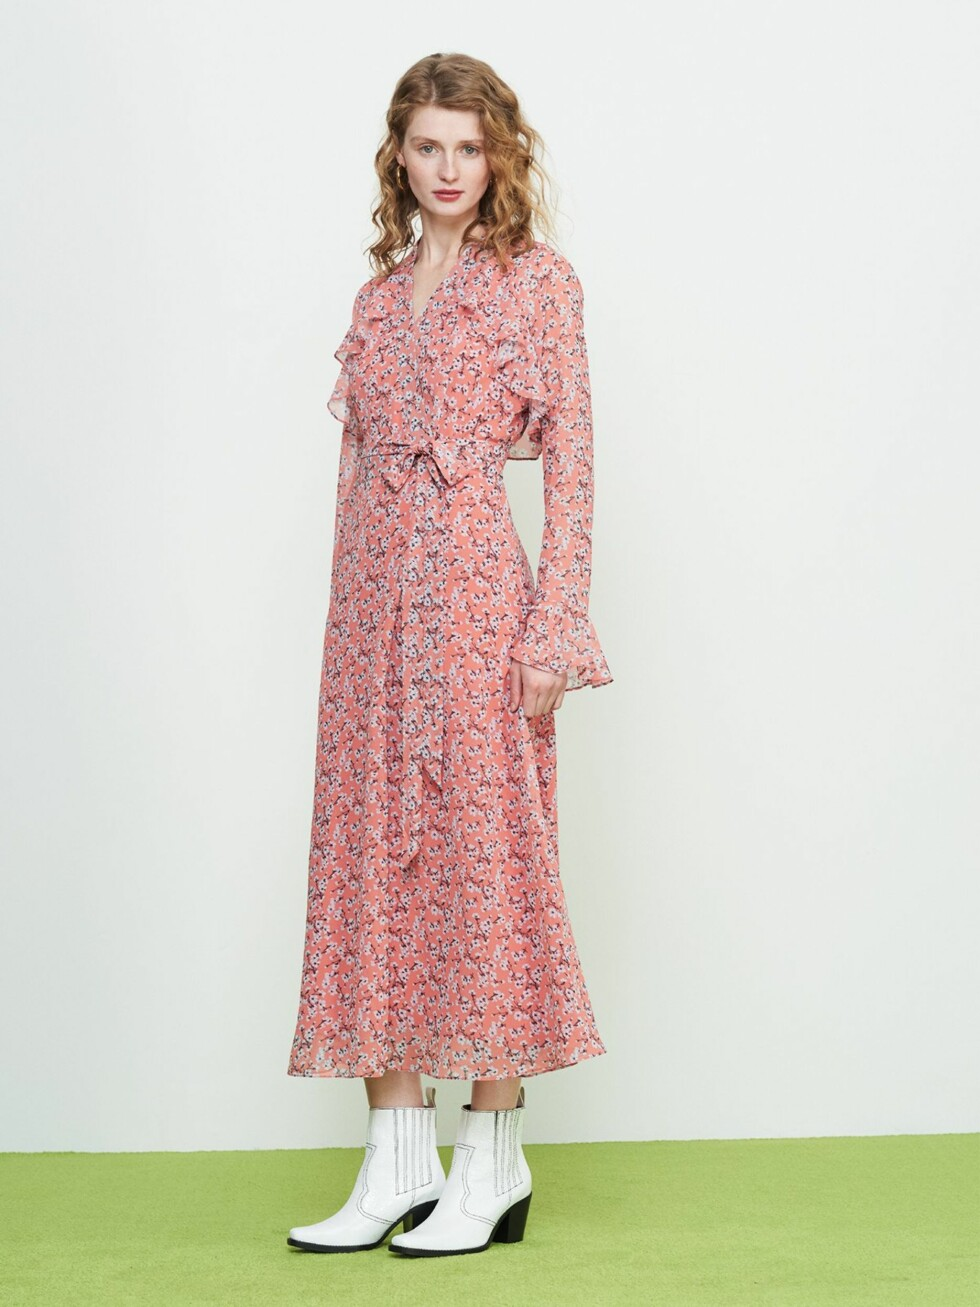 Kjole fra Kitri Studio |1442,-| https://kitristudio.eu/collections/fresh-in/products/rosalie-frill-wrap-dress?variant=7772217704514